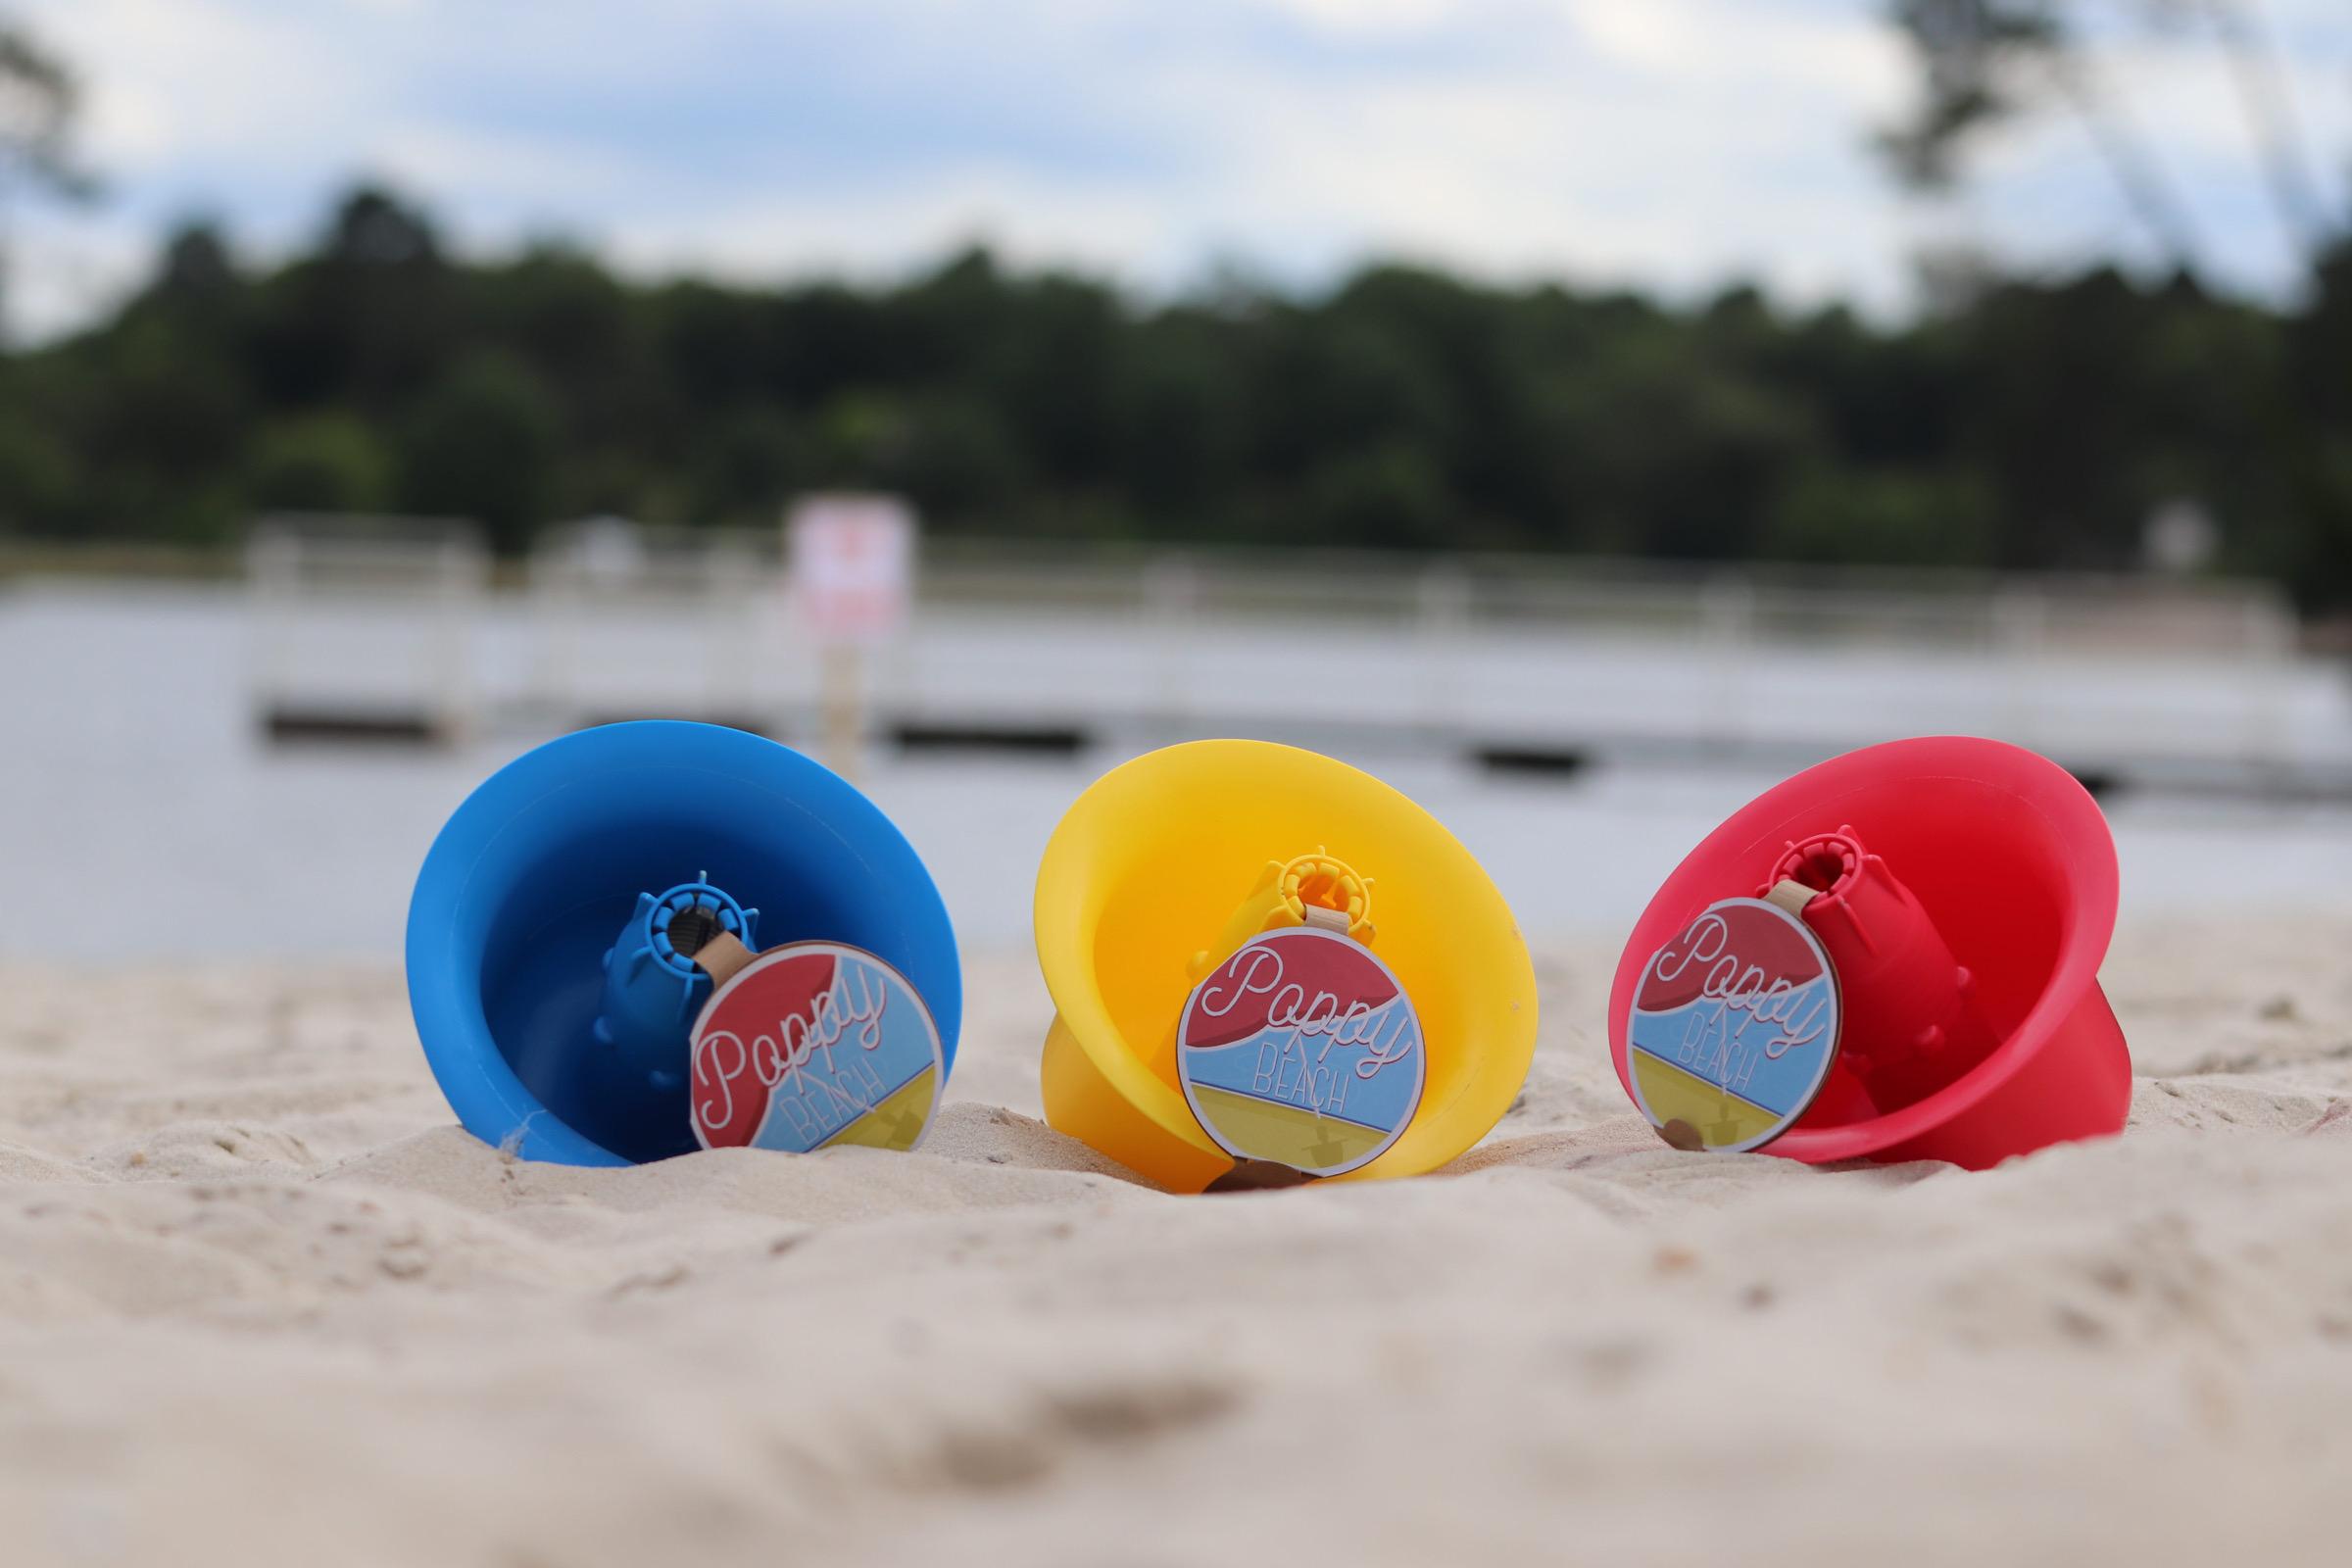 poppy beach - système innovant pour fixer son parasol